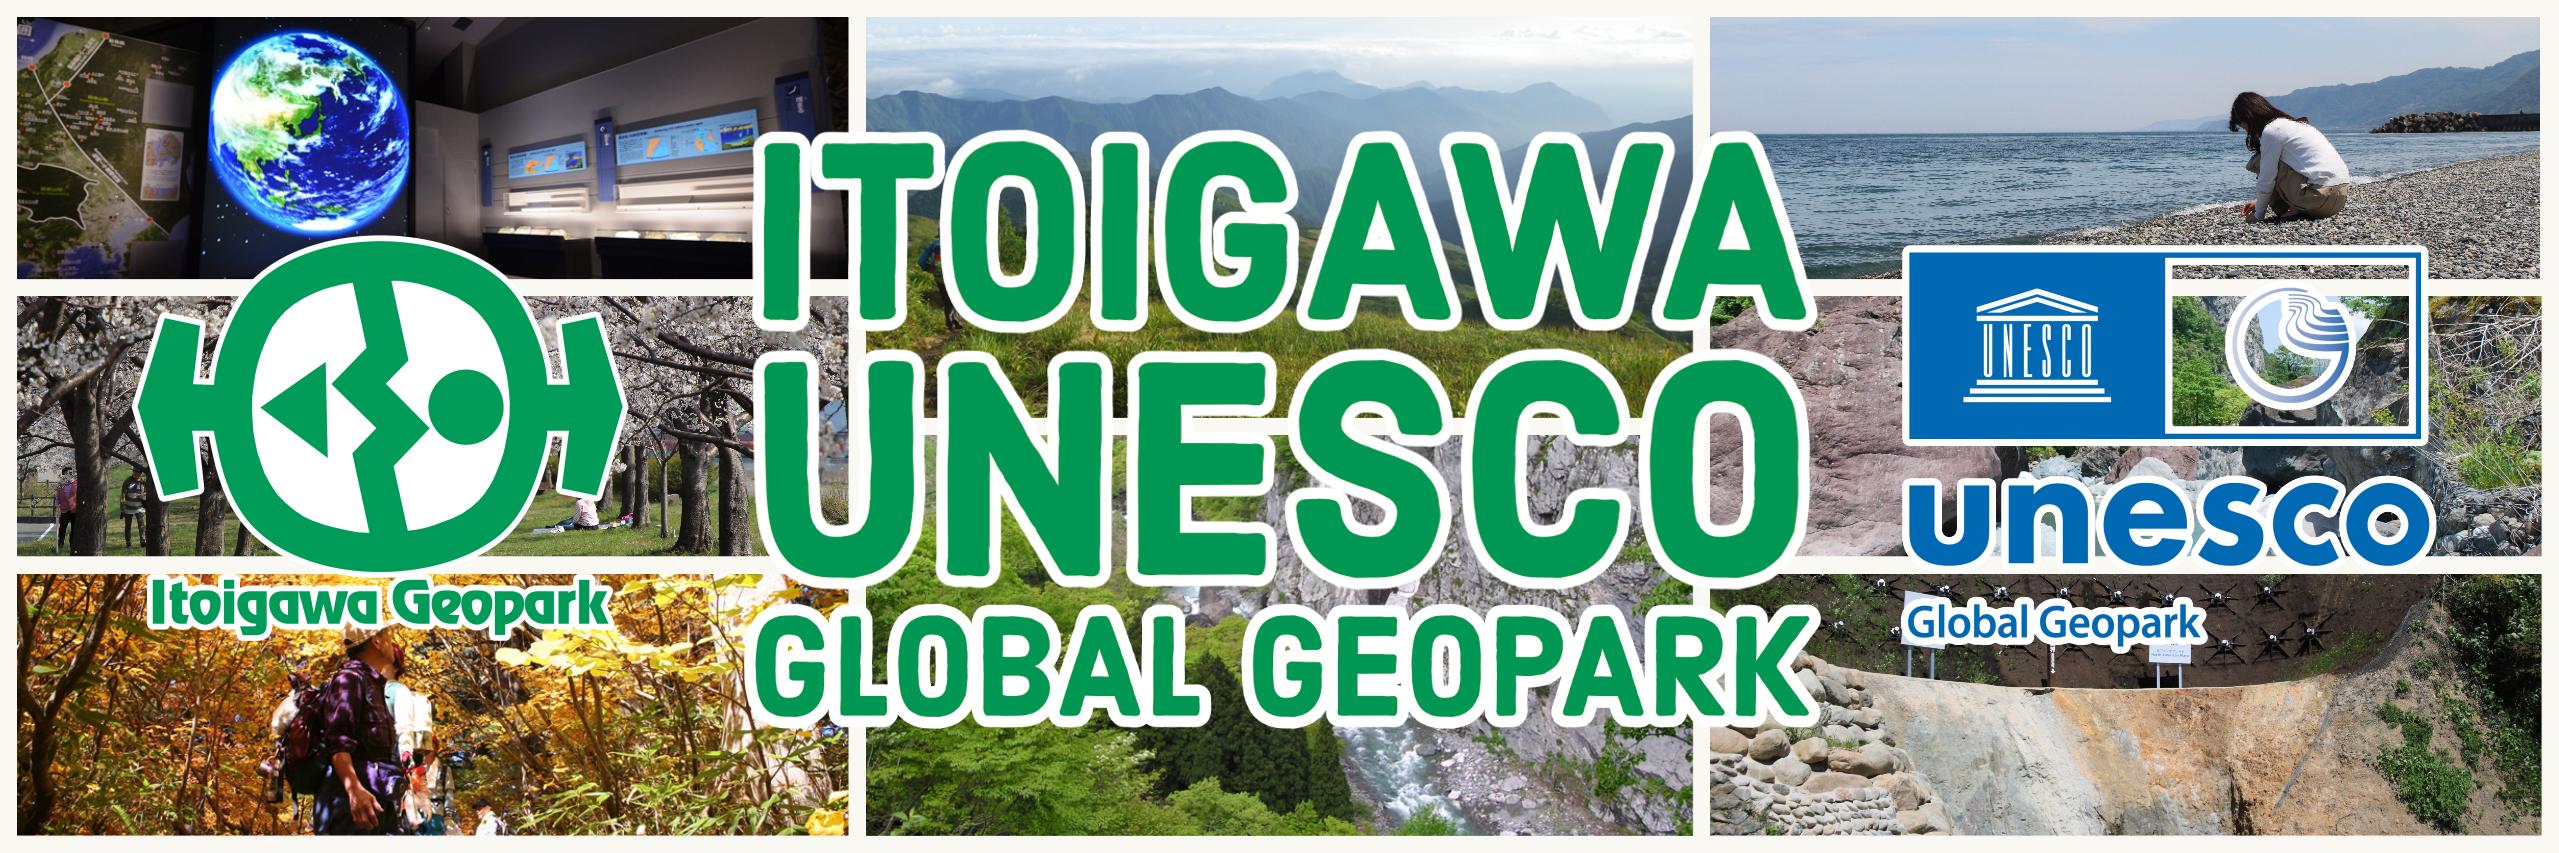 Itoigawa Unesco Geopark